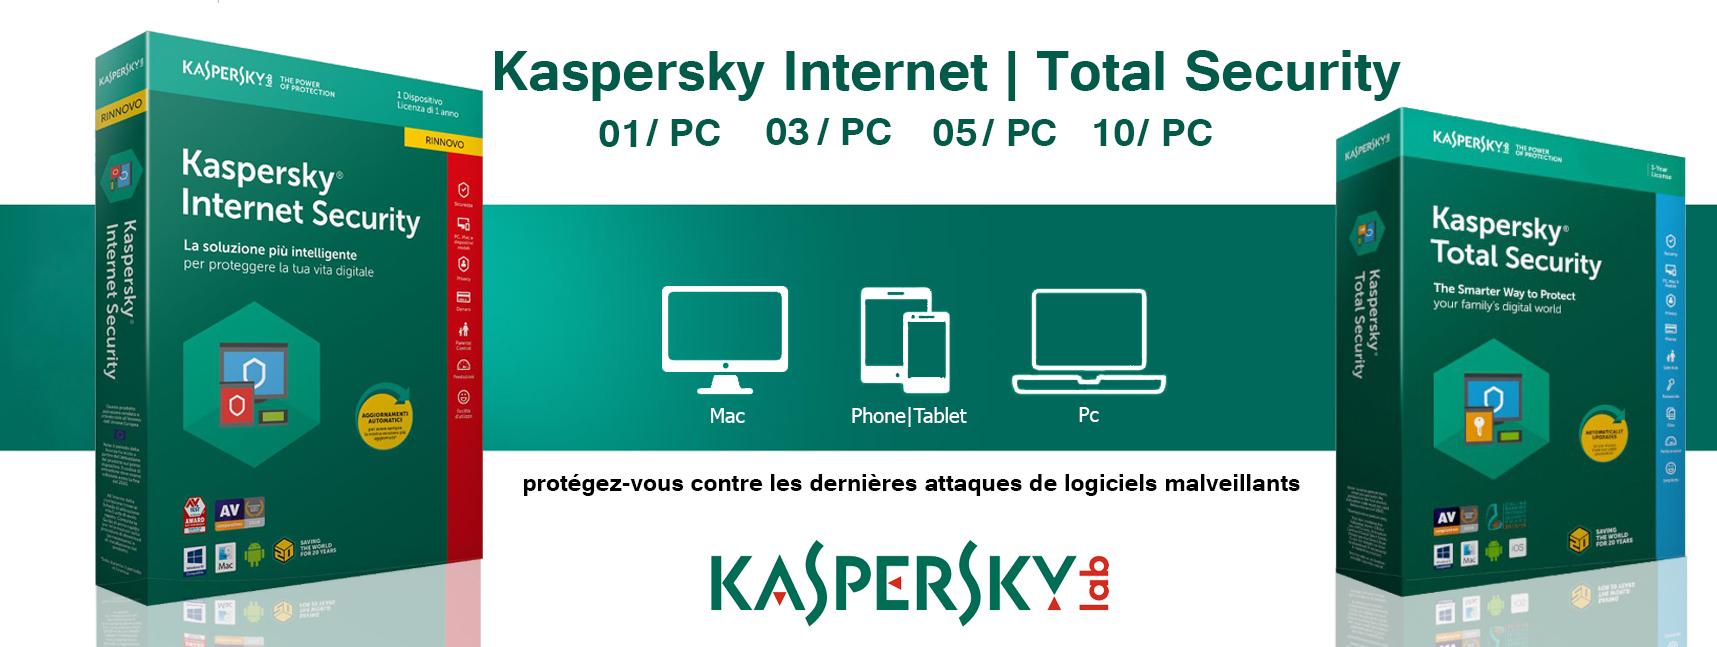 kaspesky_